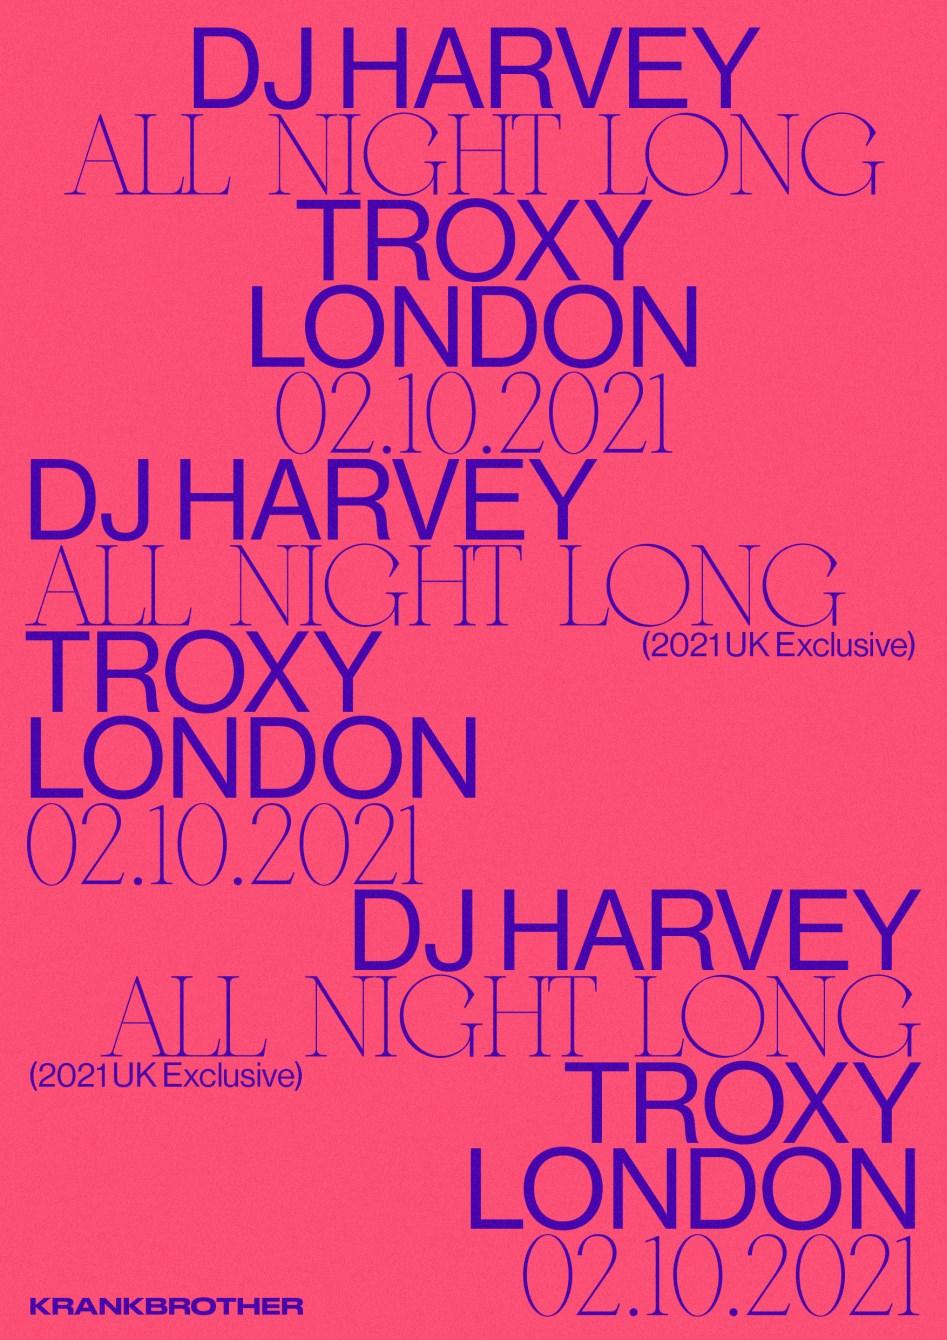 krankbrother presents DJ Harvey All Night Long - Flyer front